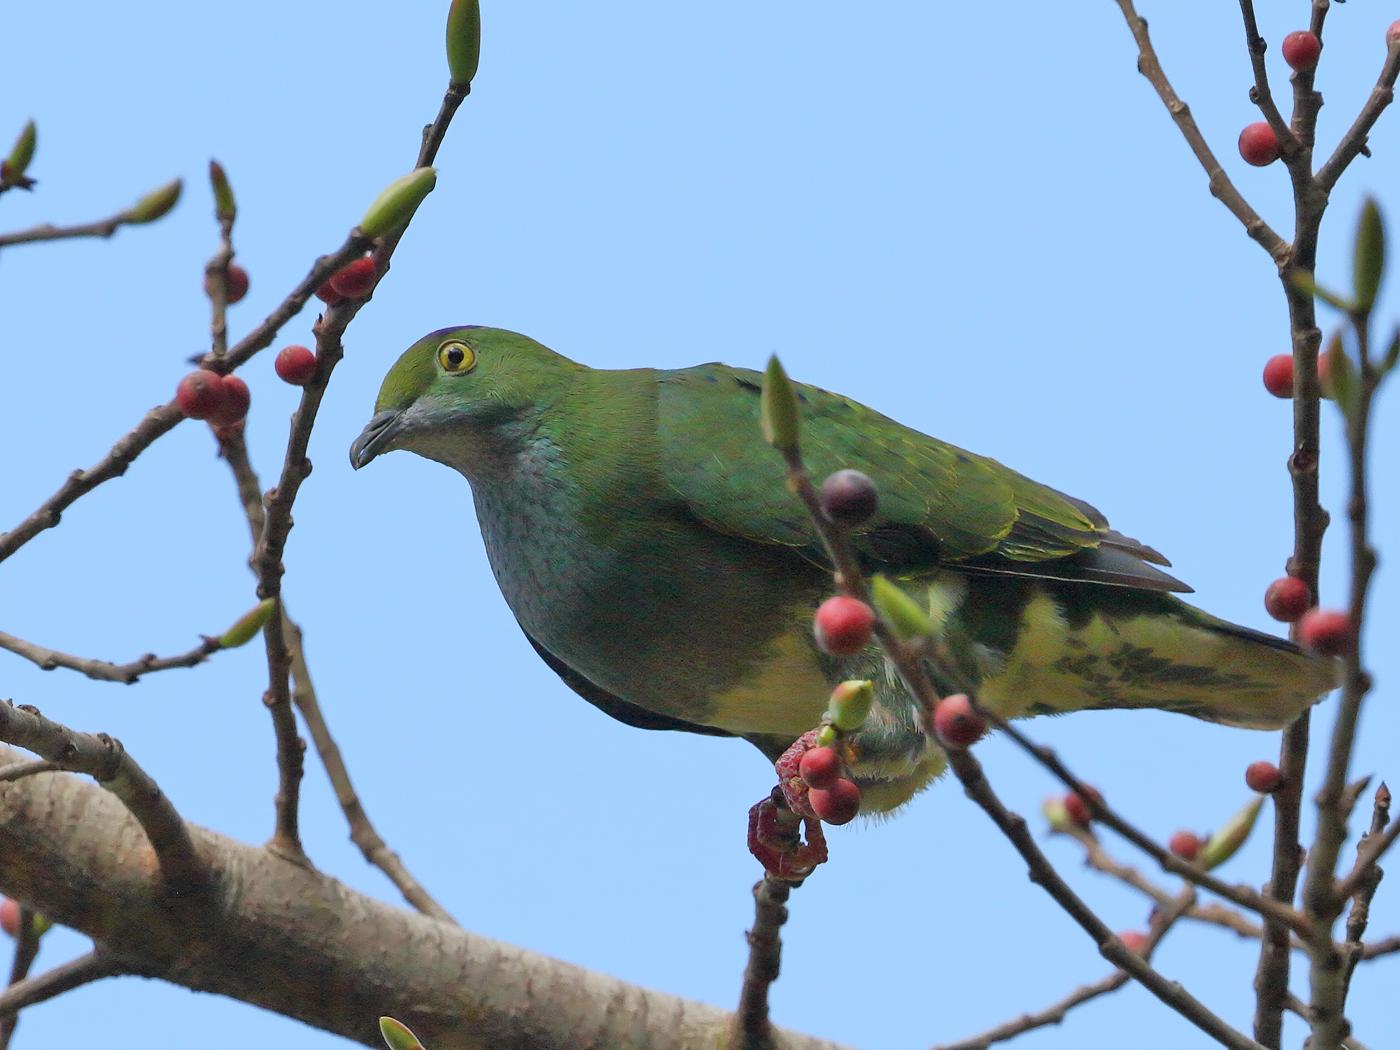 Superb Fruit-Dove (Image ID 29889)